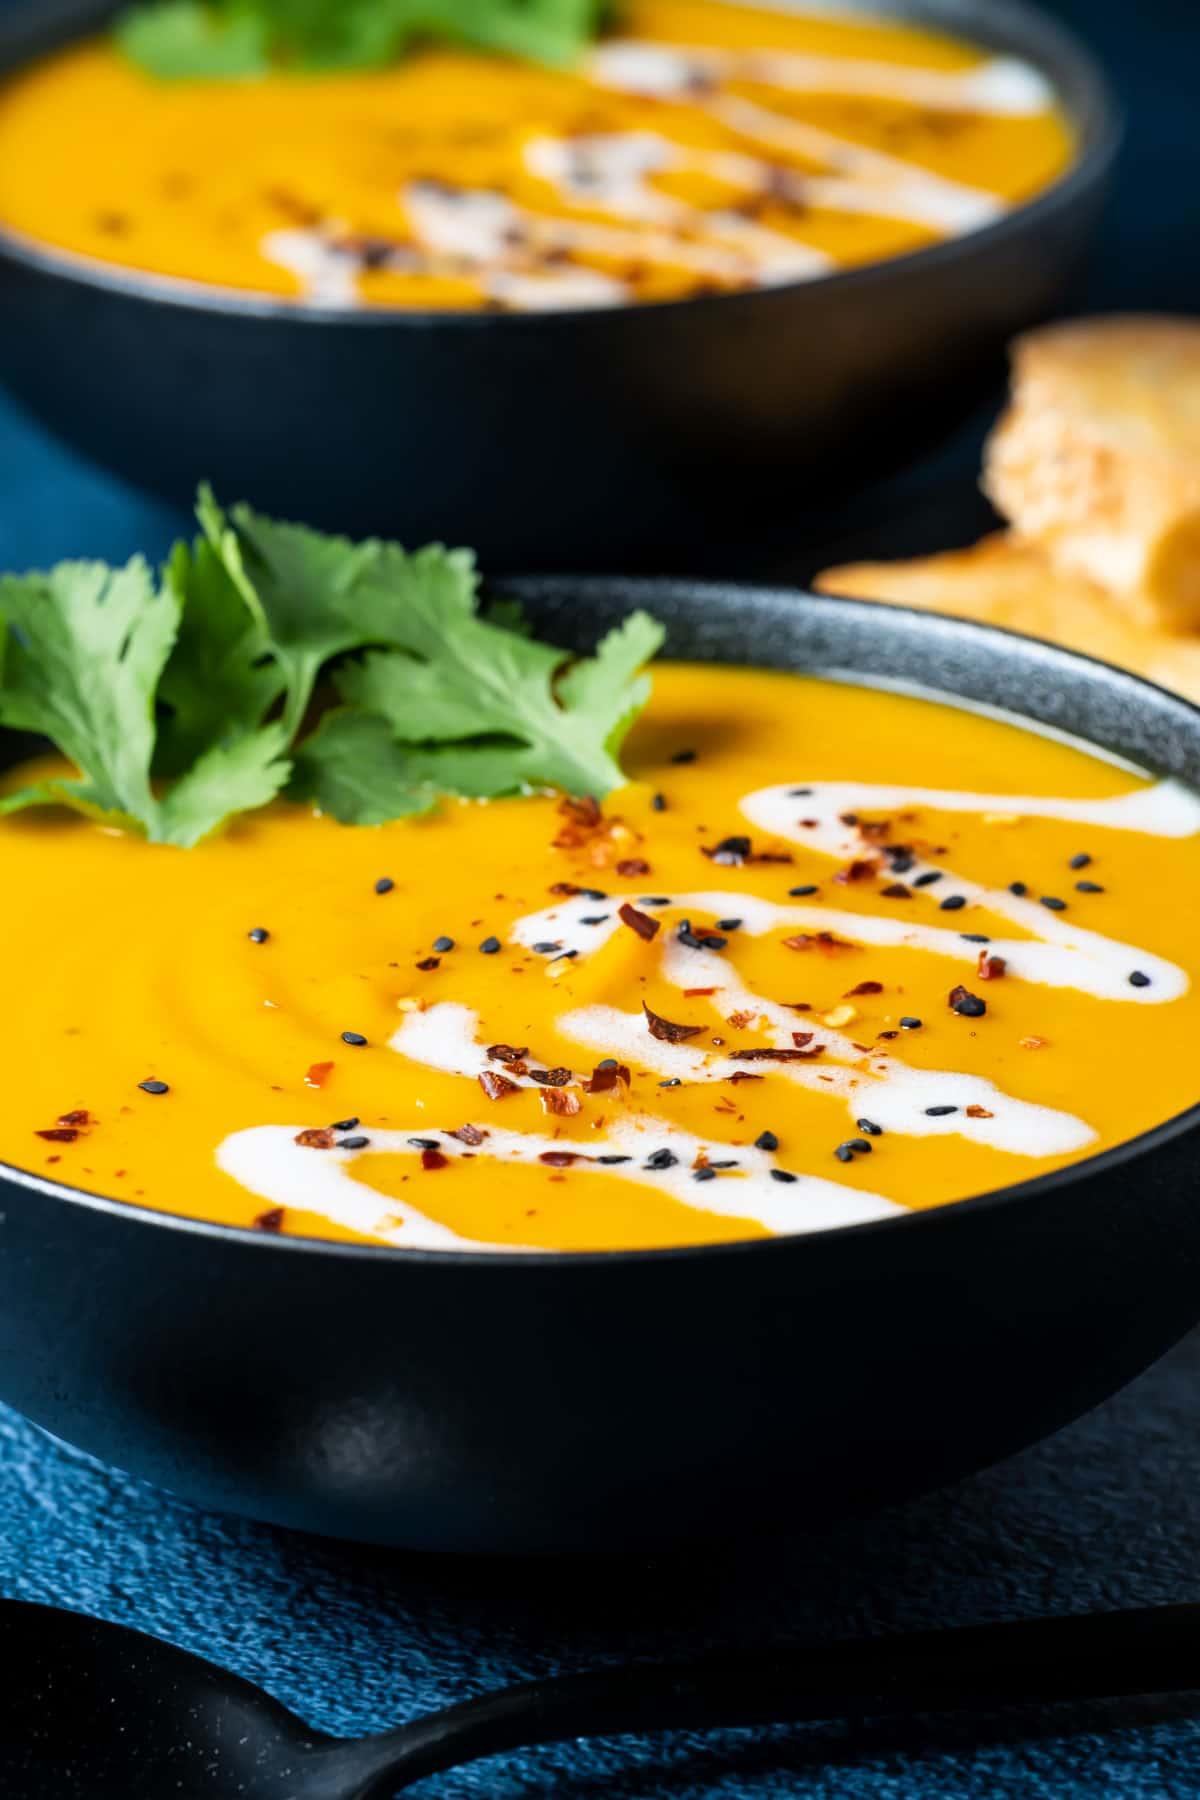 Thai sweet potato soup topped with fresh cilantro in a black bowl.